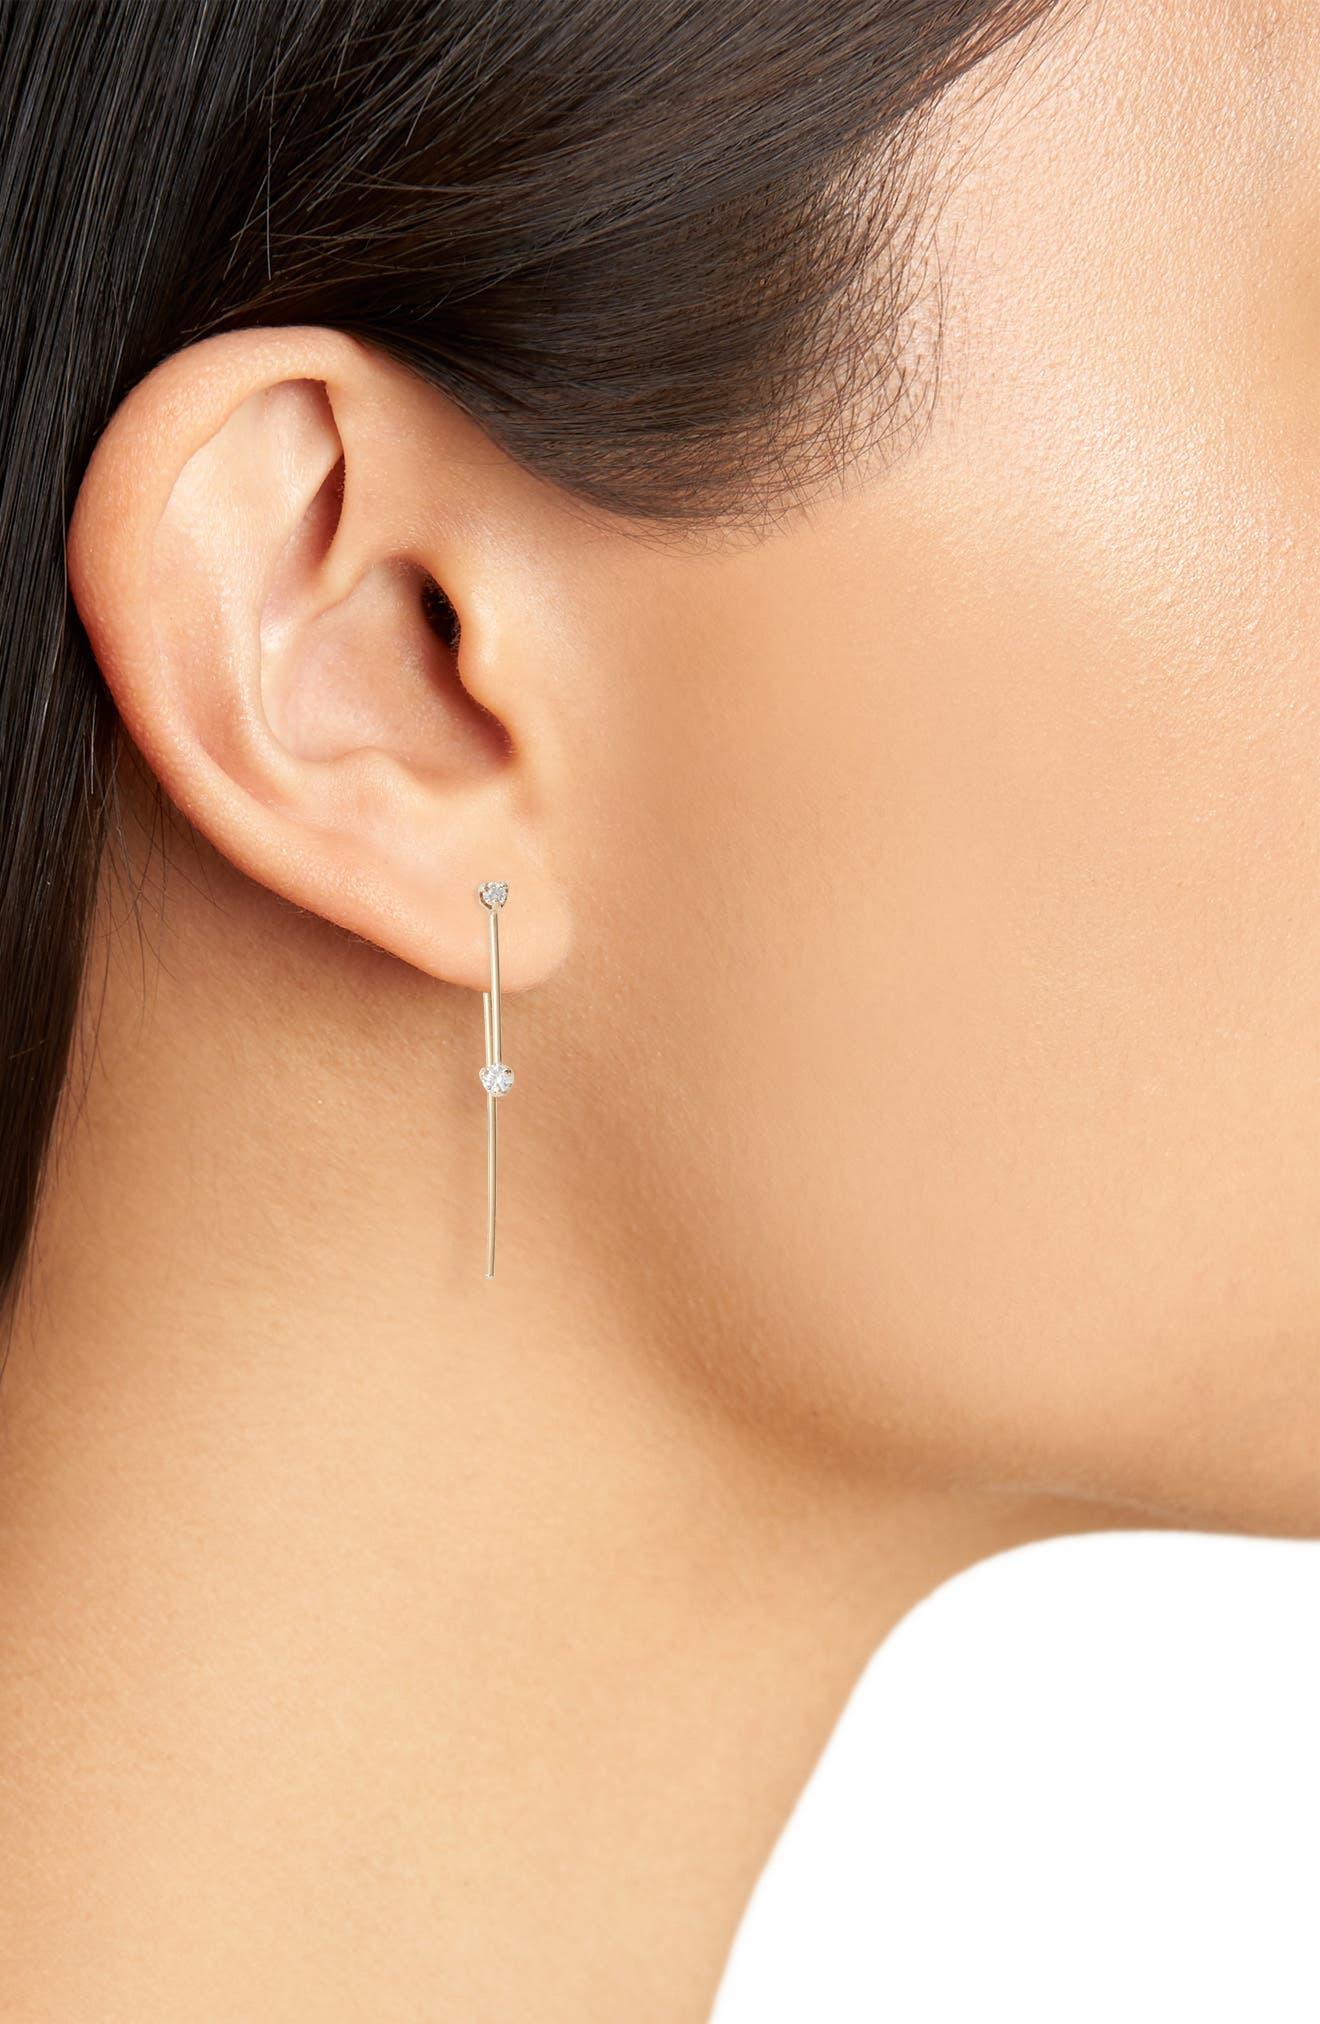 Double Diamond Threader Earrings,                             Alternate thumbnail 2, color,                             YELLOW GOLD